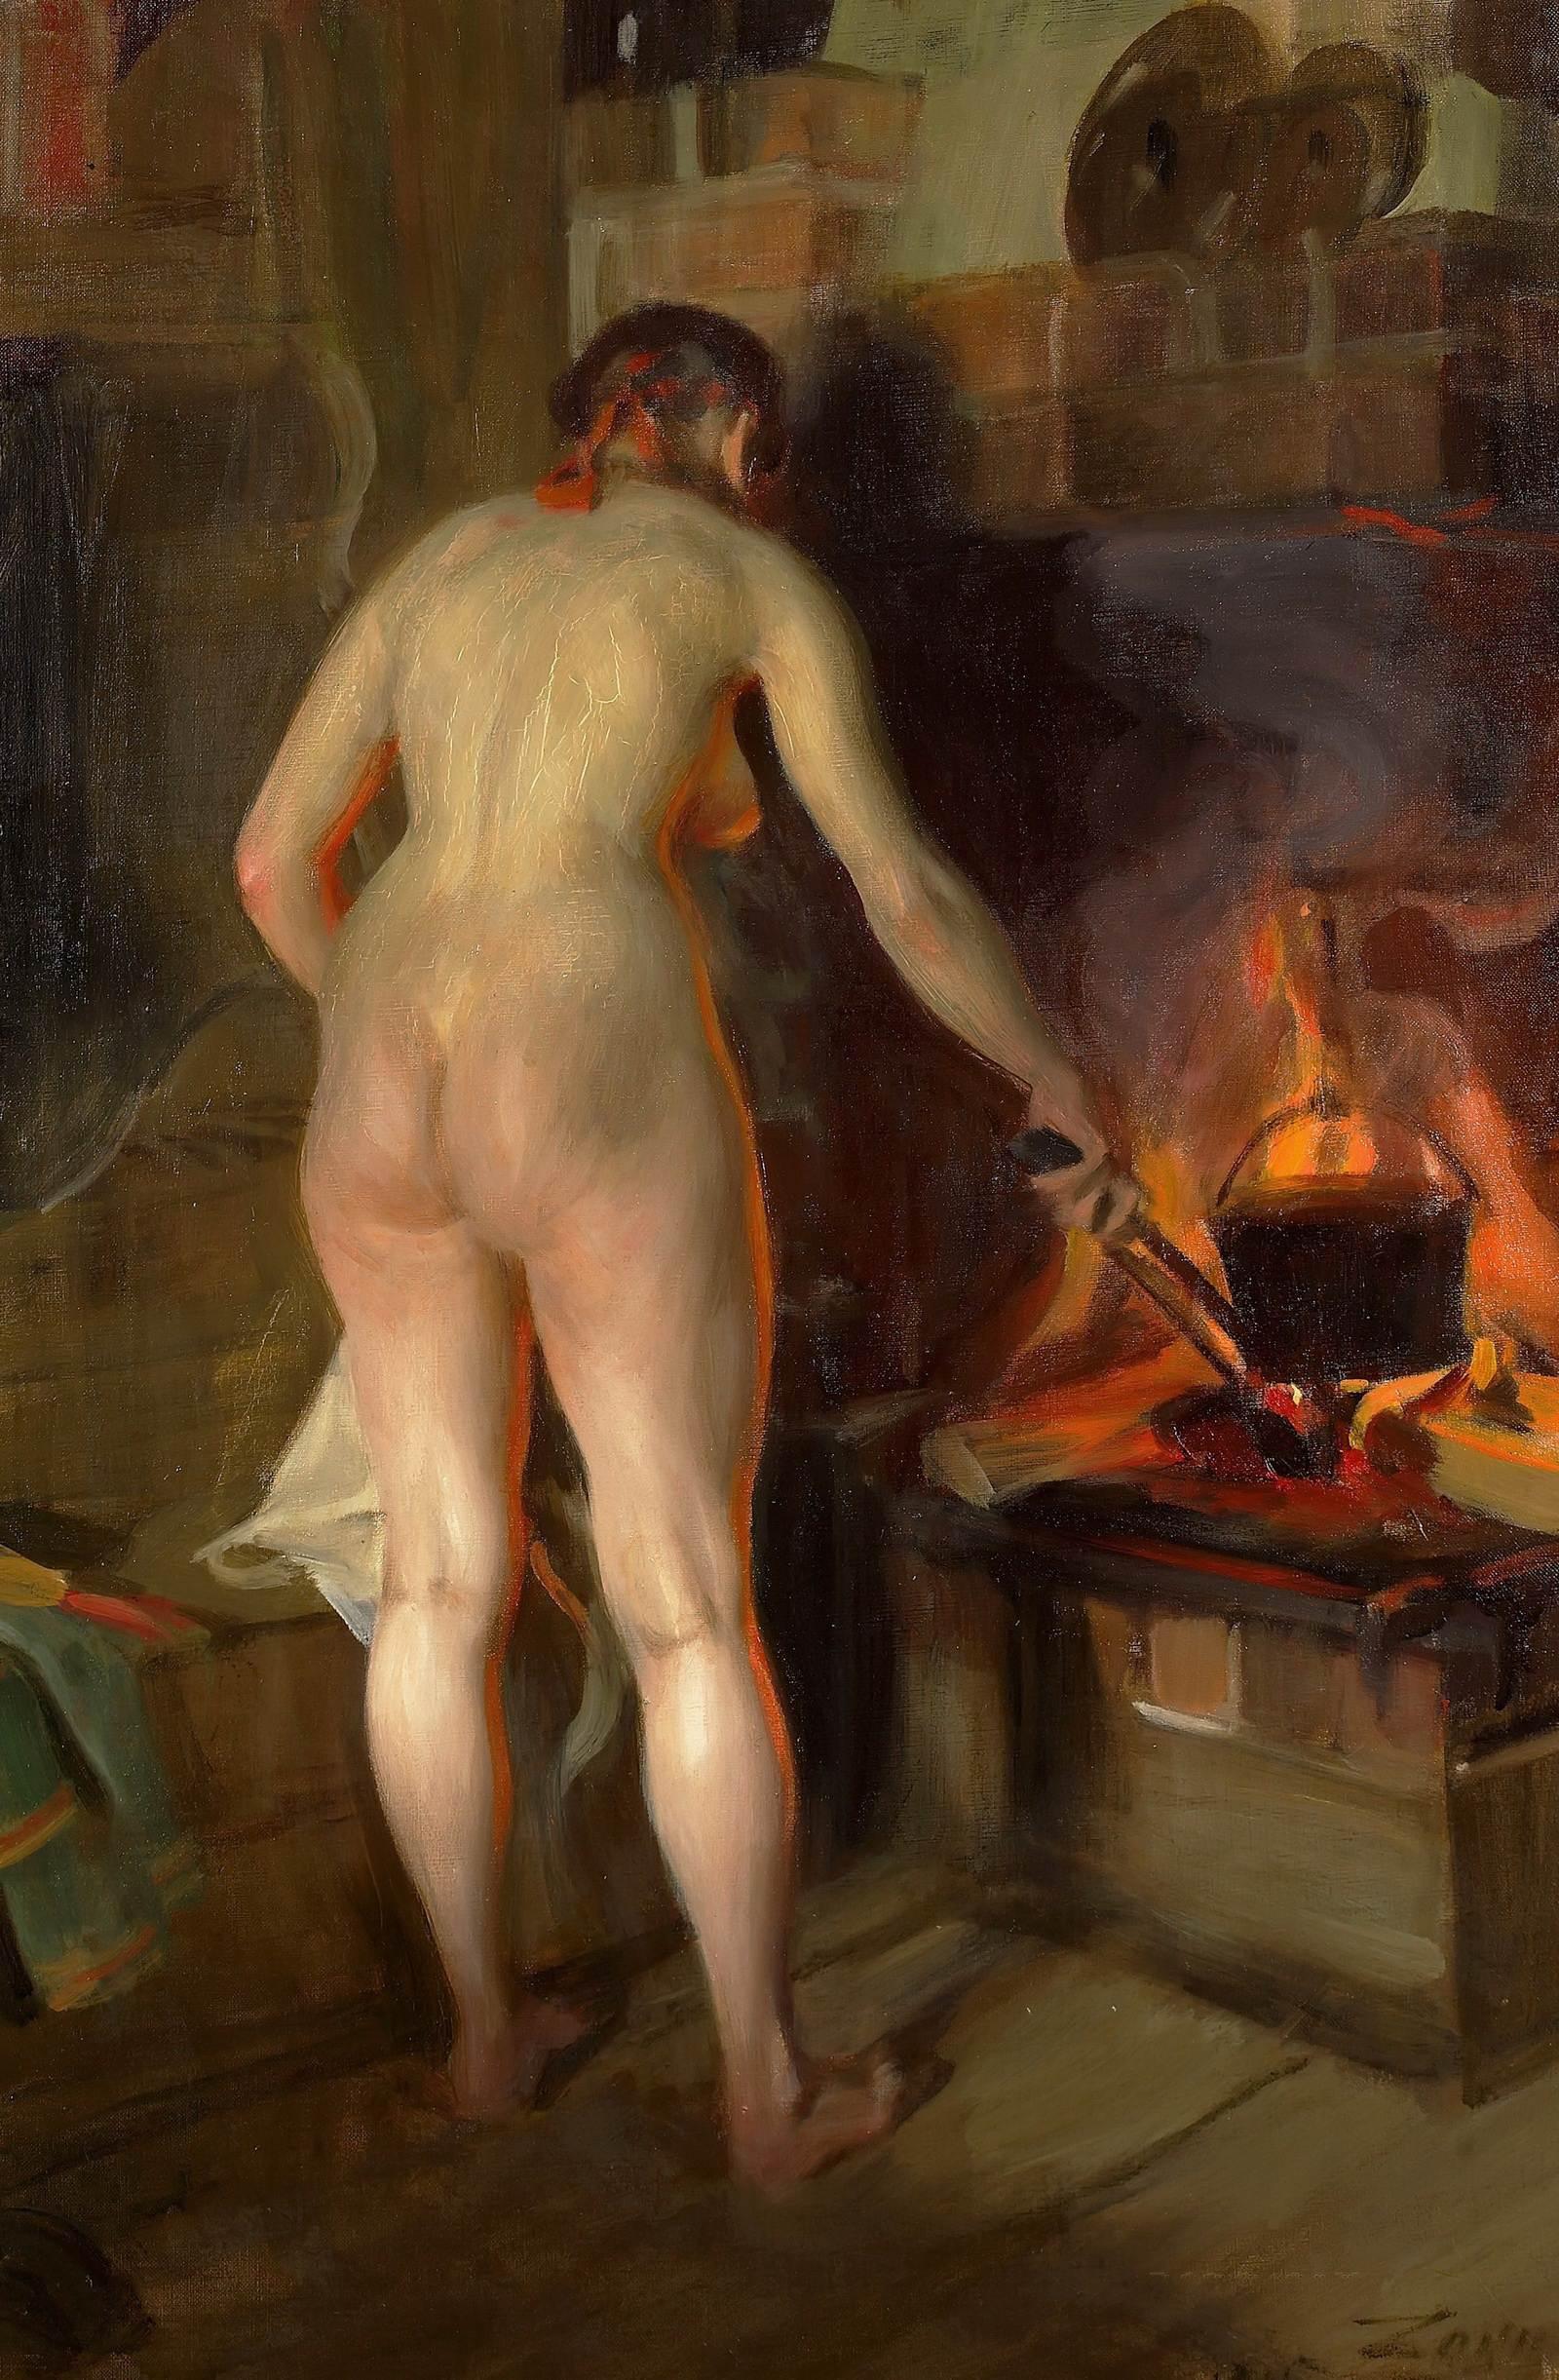 Anders Leonard Zorn. 1860-1920. Котелок с картошкой. 1915, 93 х 62 см. Частная коллекция